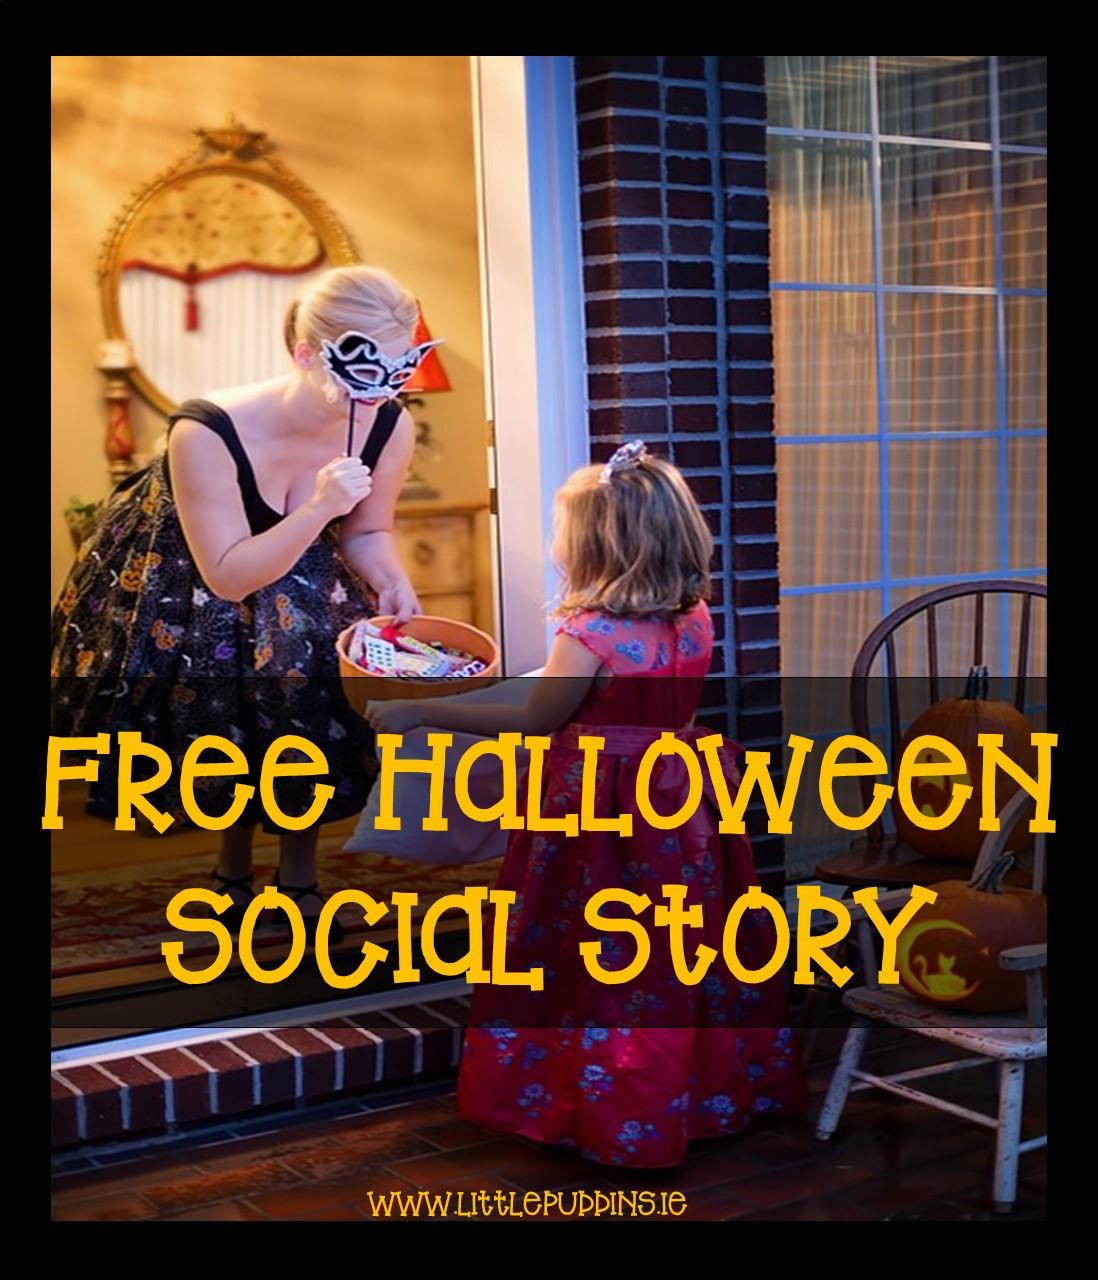 FREE Halloween Social Story